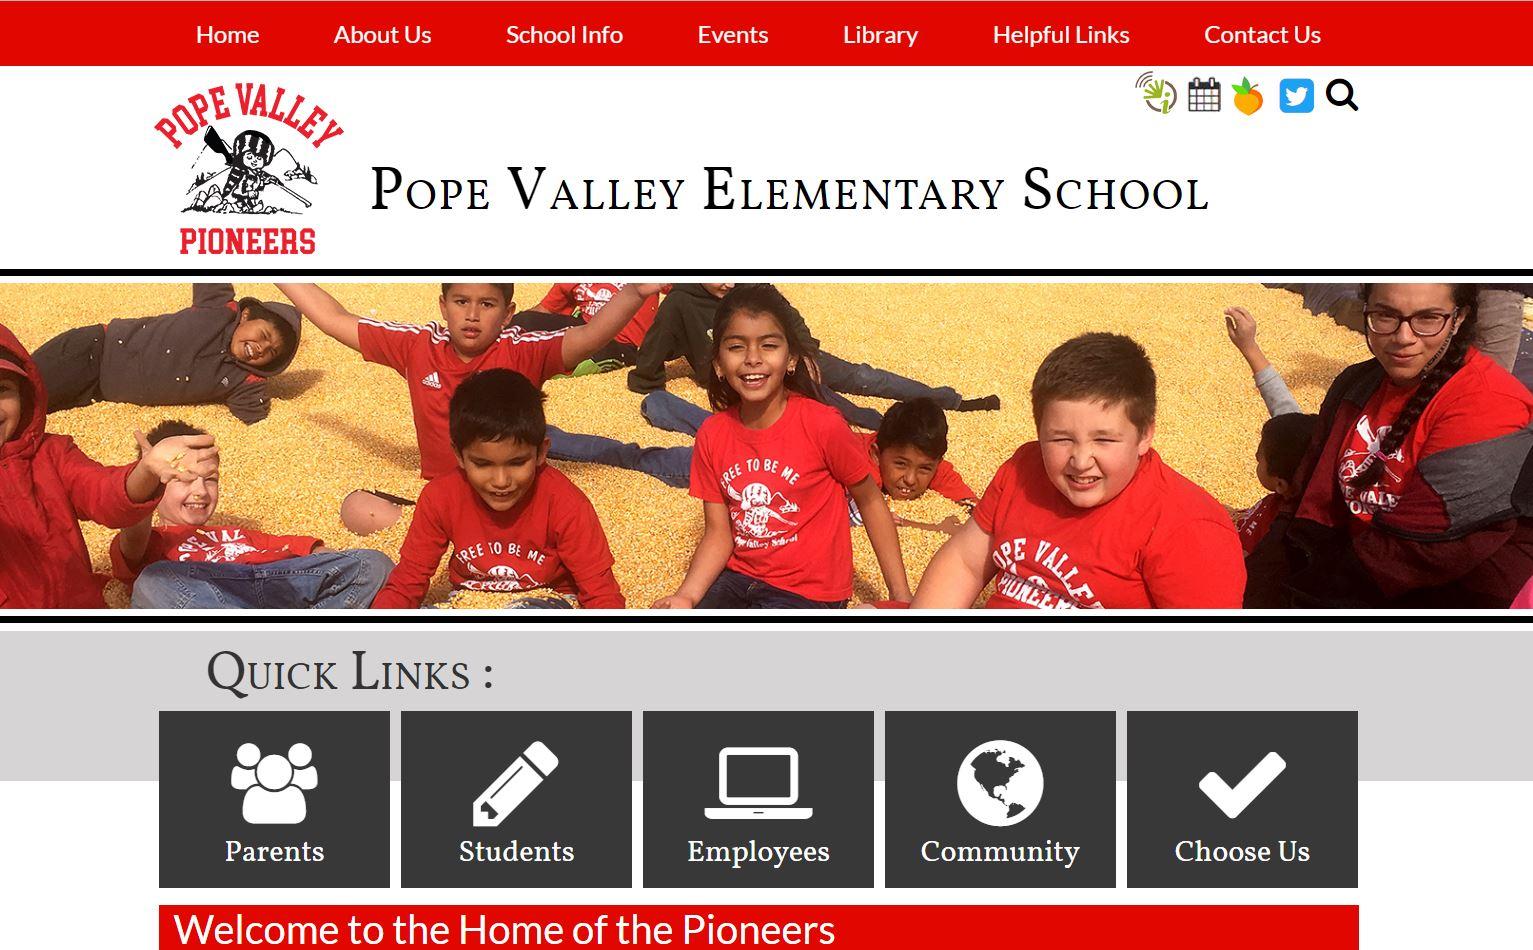 Pope Valley Elementary School